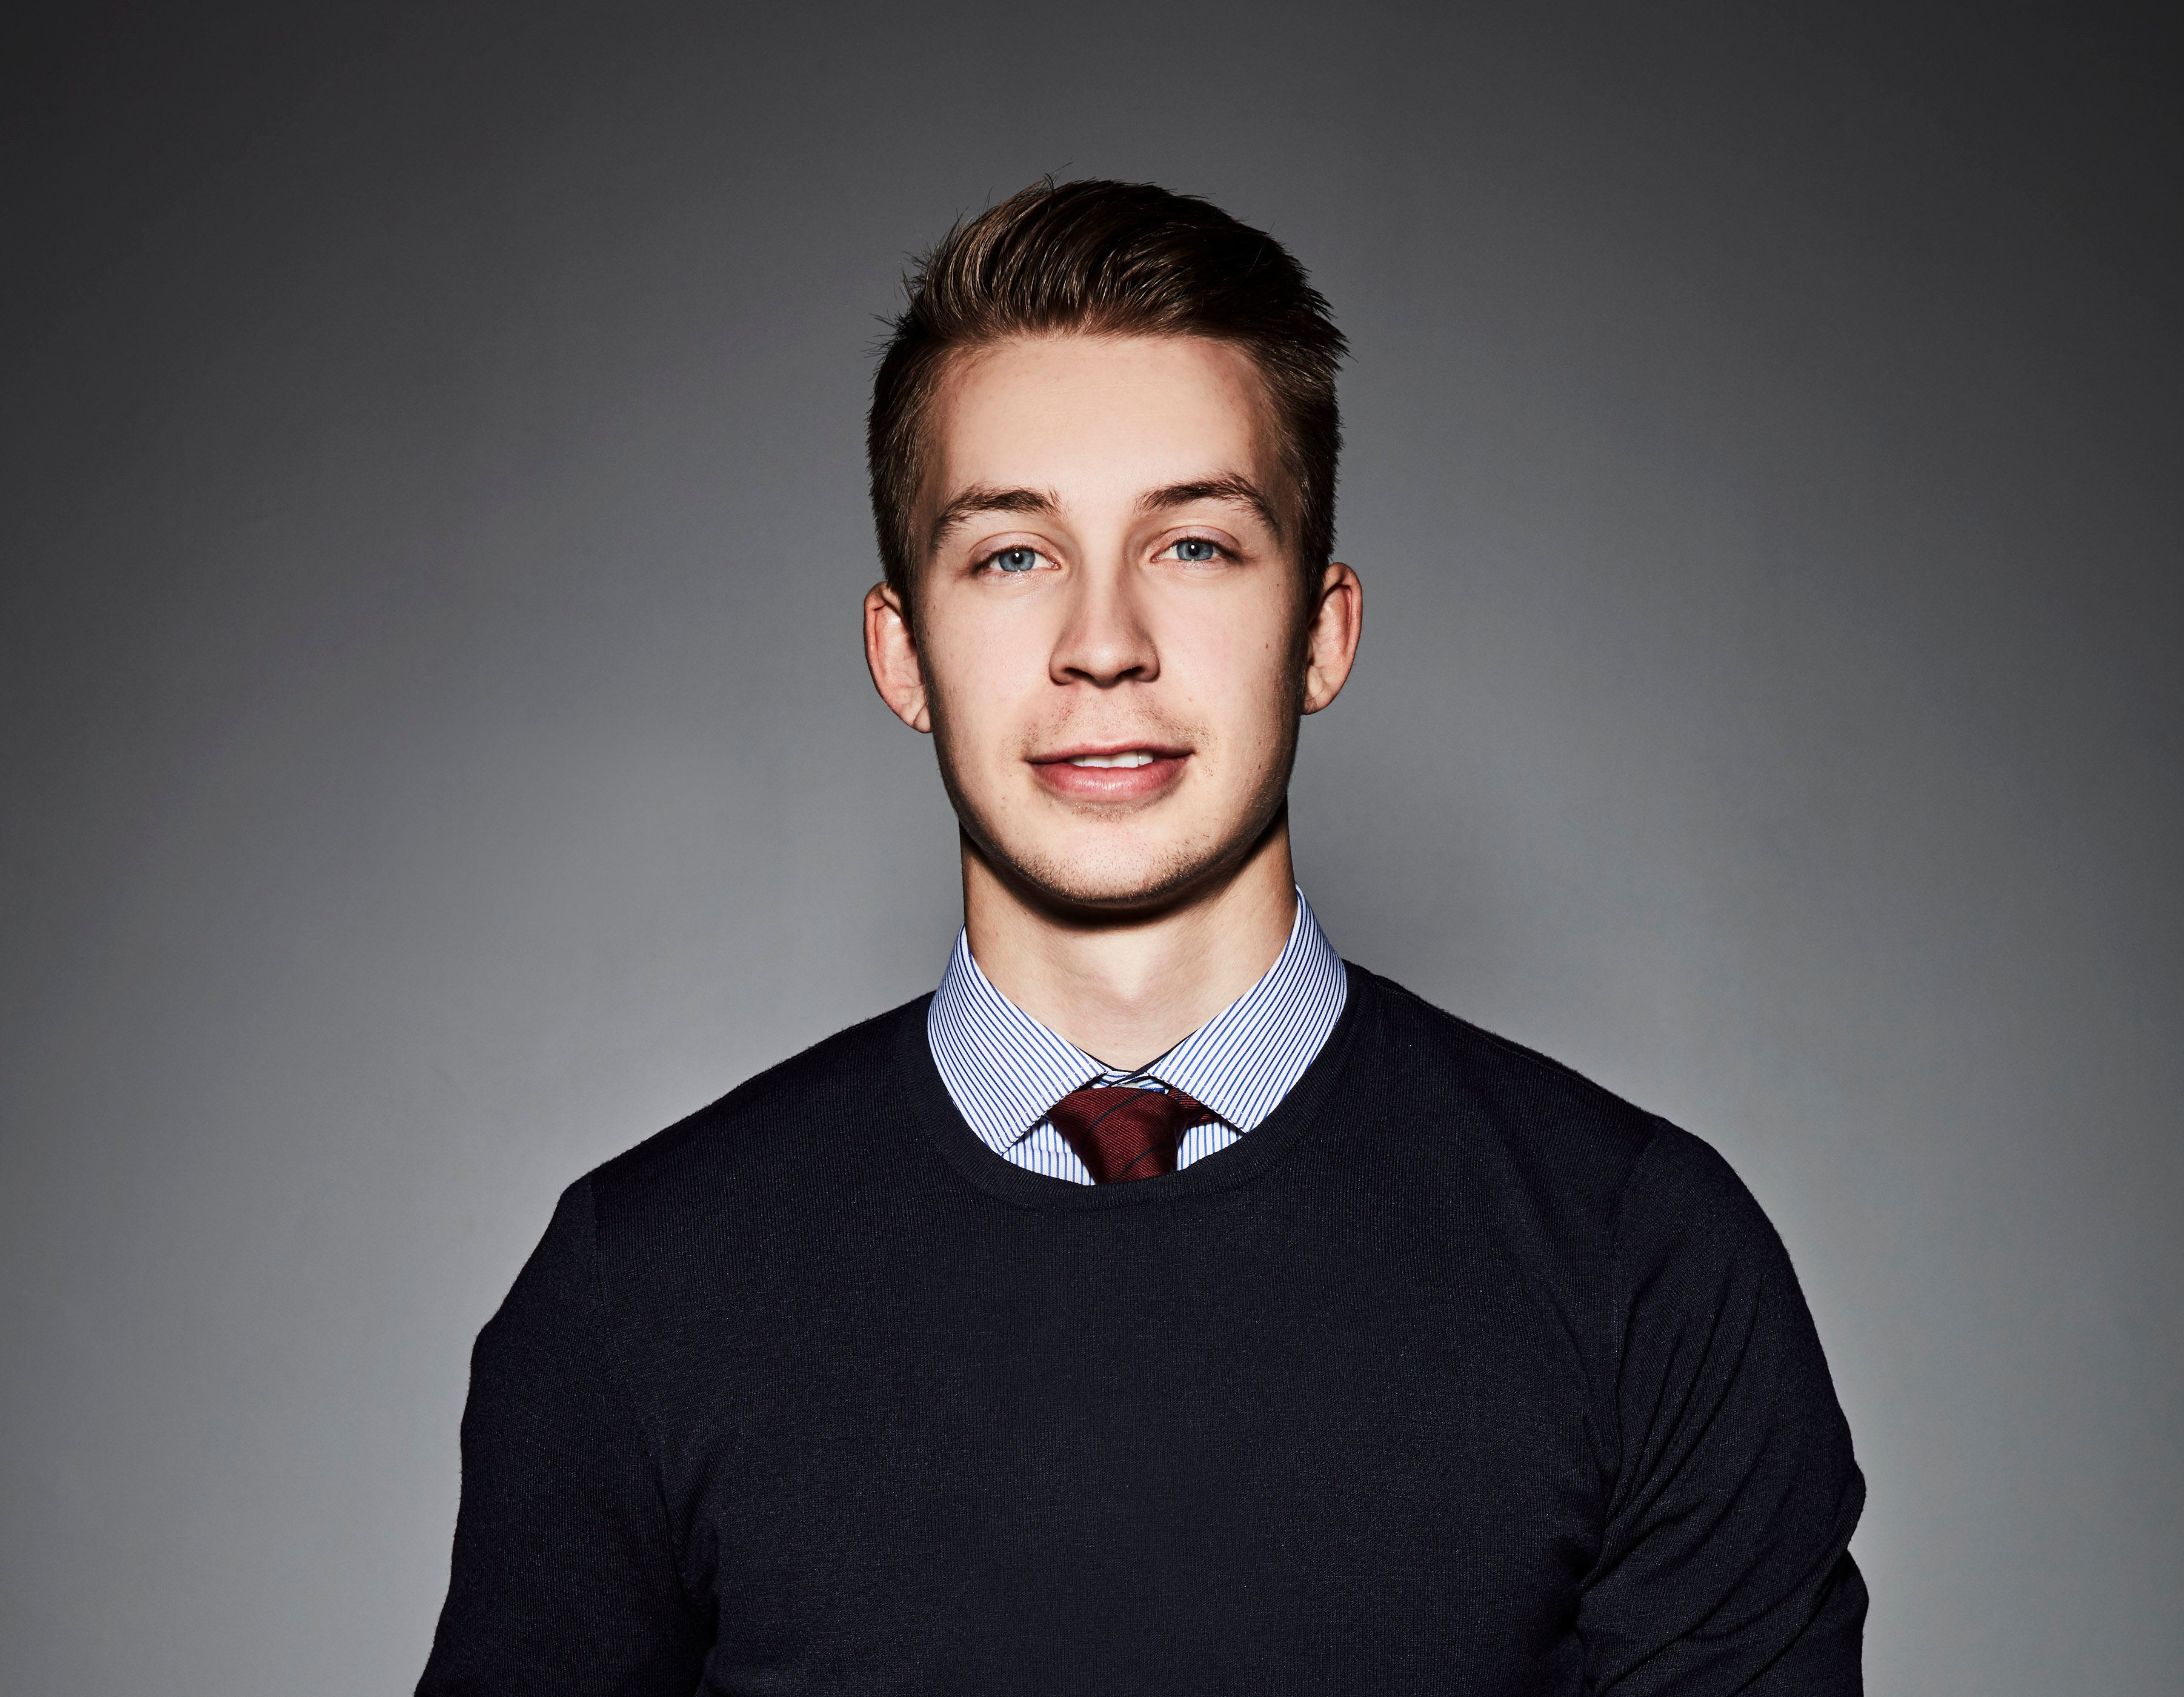 Staffan Blomgren